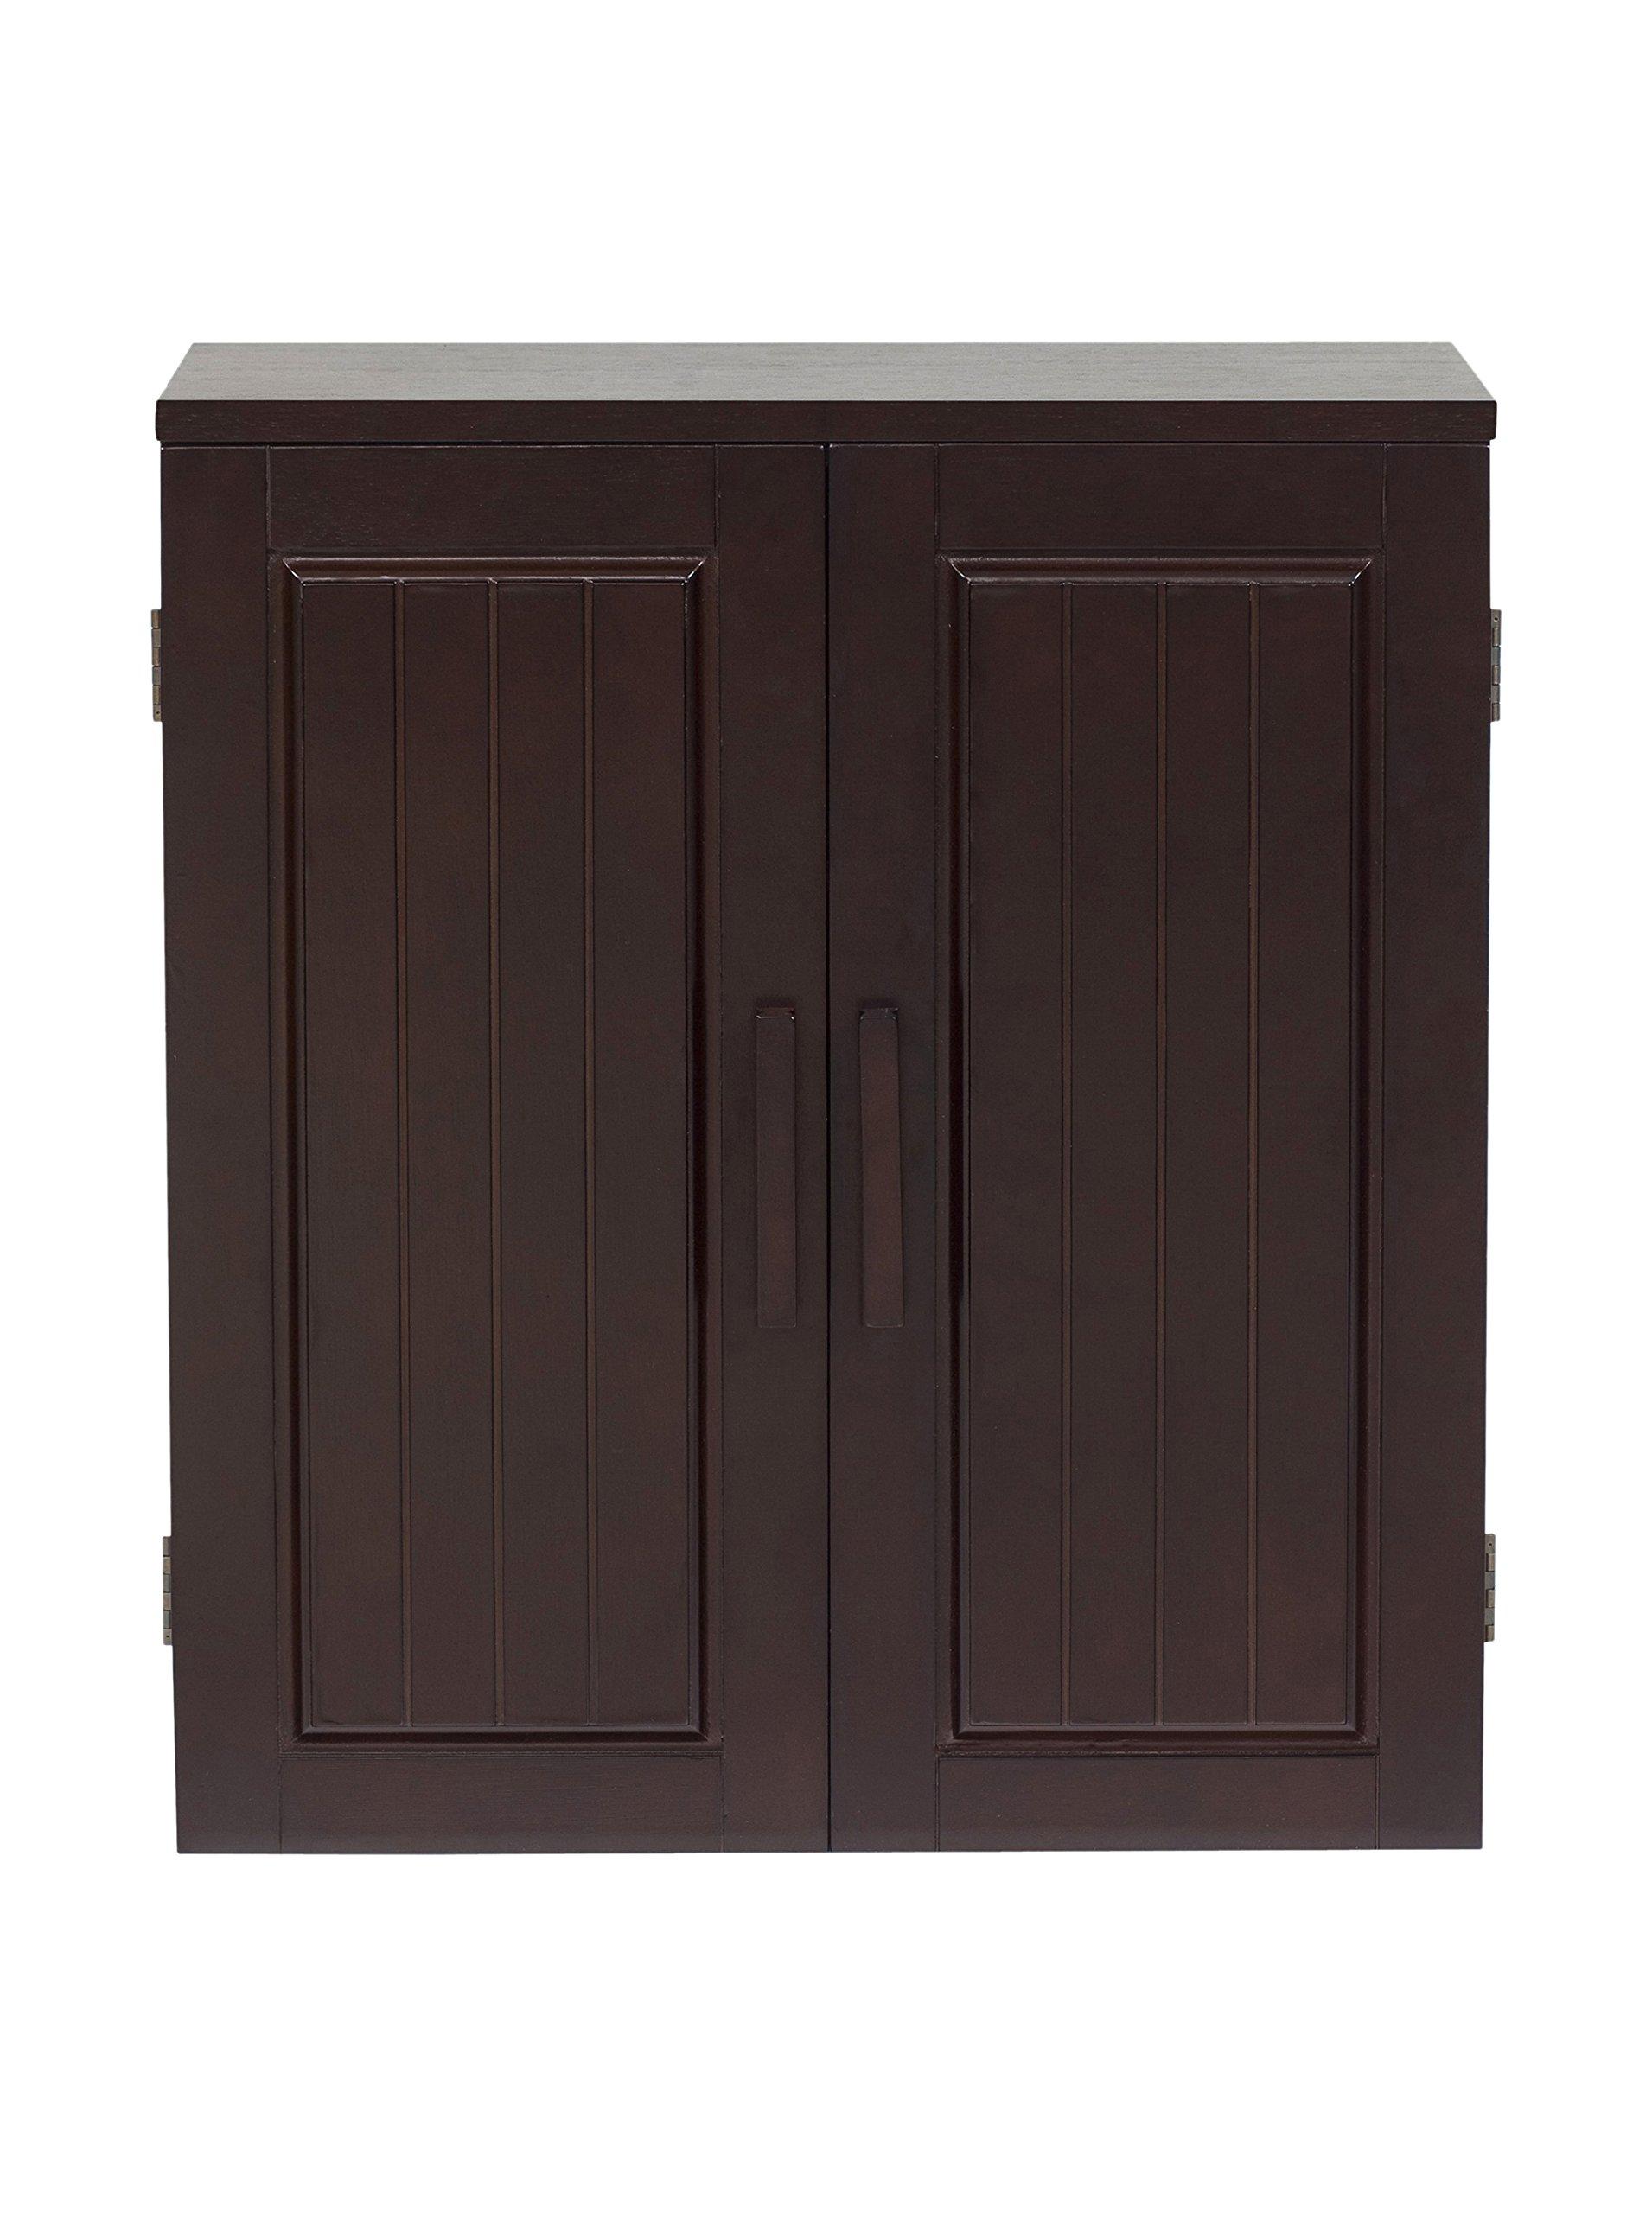 Elegant Home Fashions Catalina 22.5x20'' Wall Cabinet - Dark Espresso